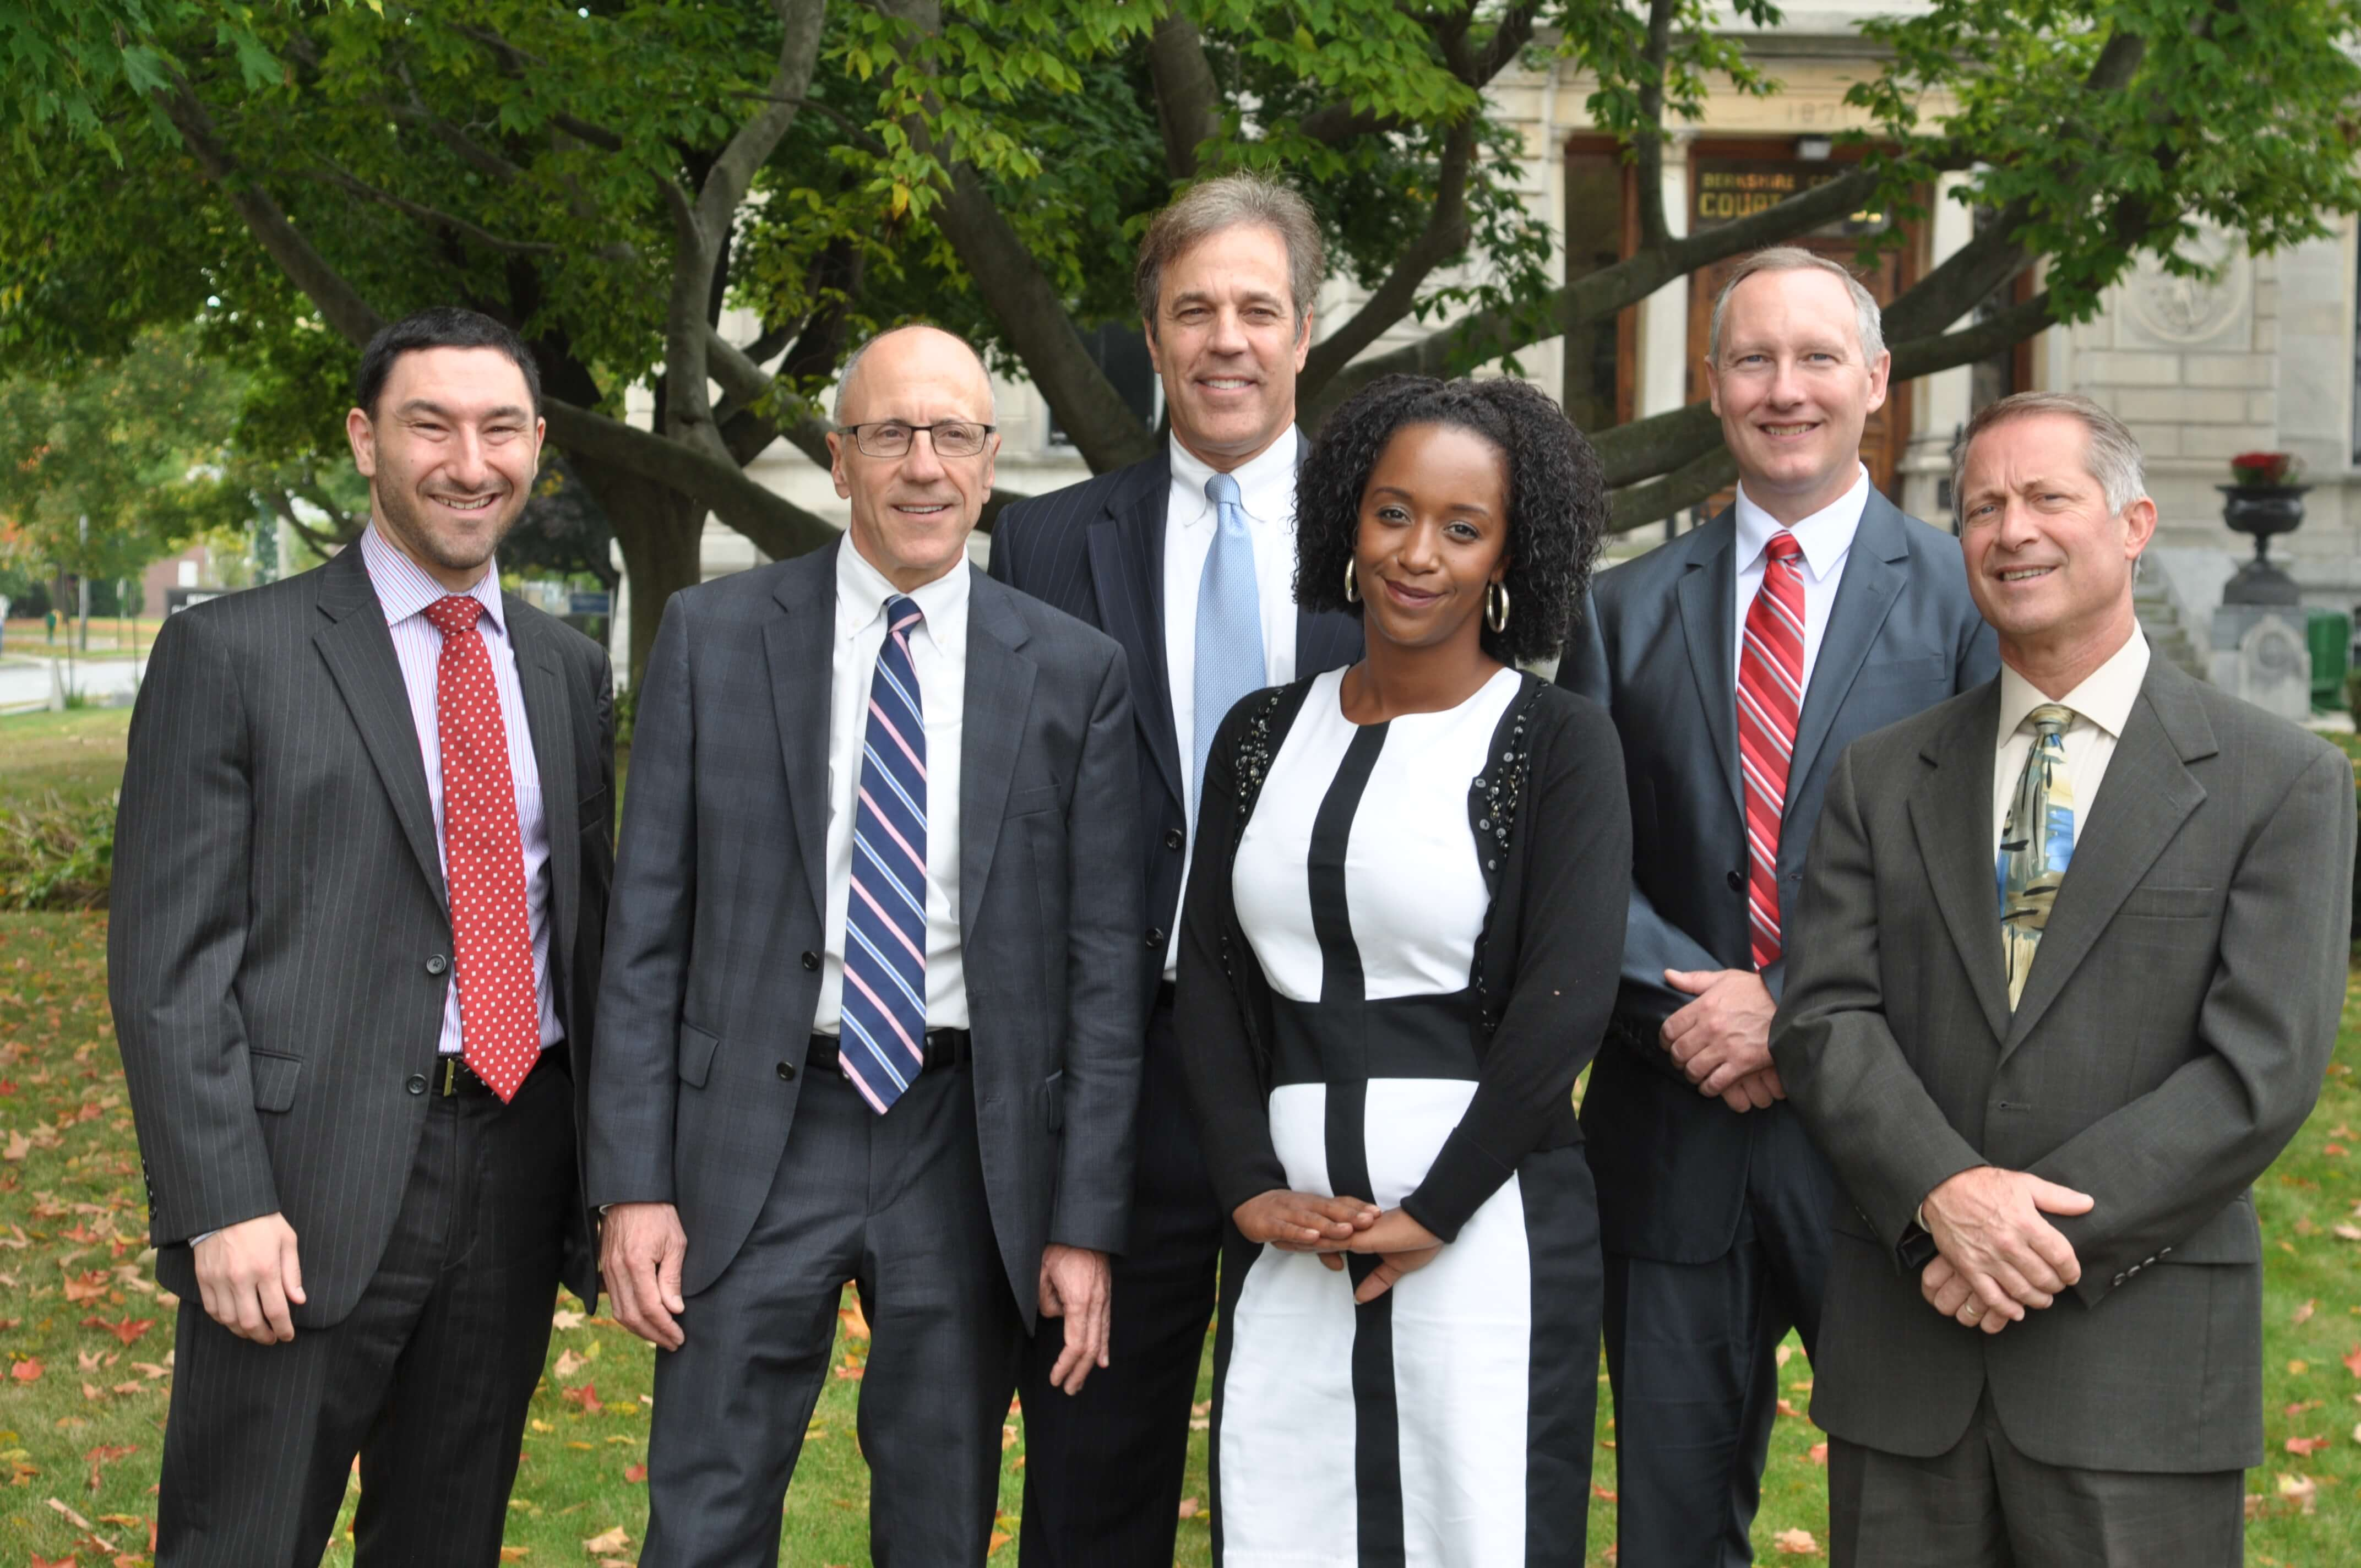 Attorney Matt Mozian, Tom Campoli, Peri Campoli, Scott Ellis, Robert Monteleone, Jr. with Myia Gaulden in Pittsfield, MA